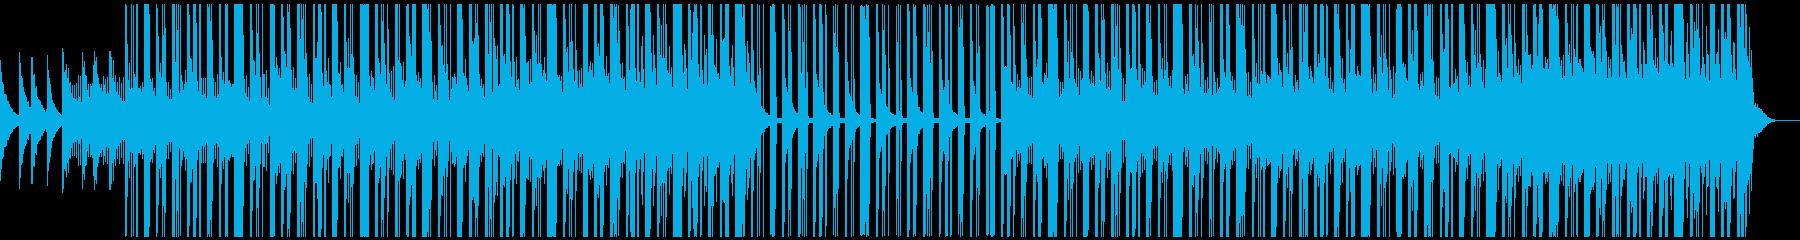 halloween beatの再生済みの波形